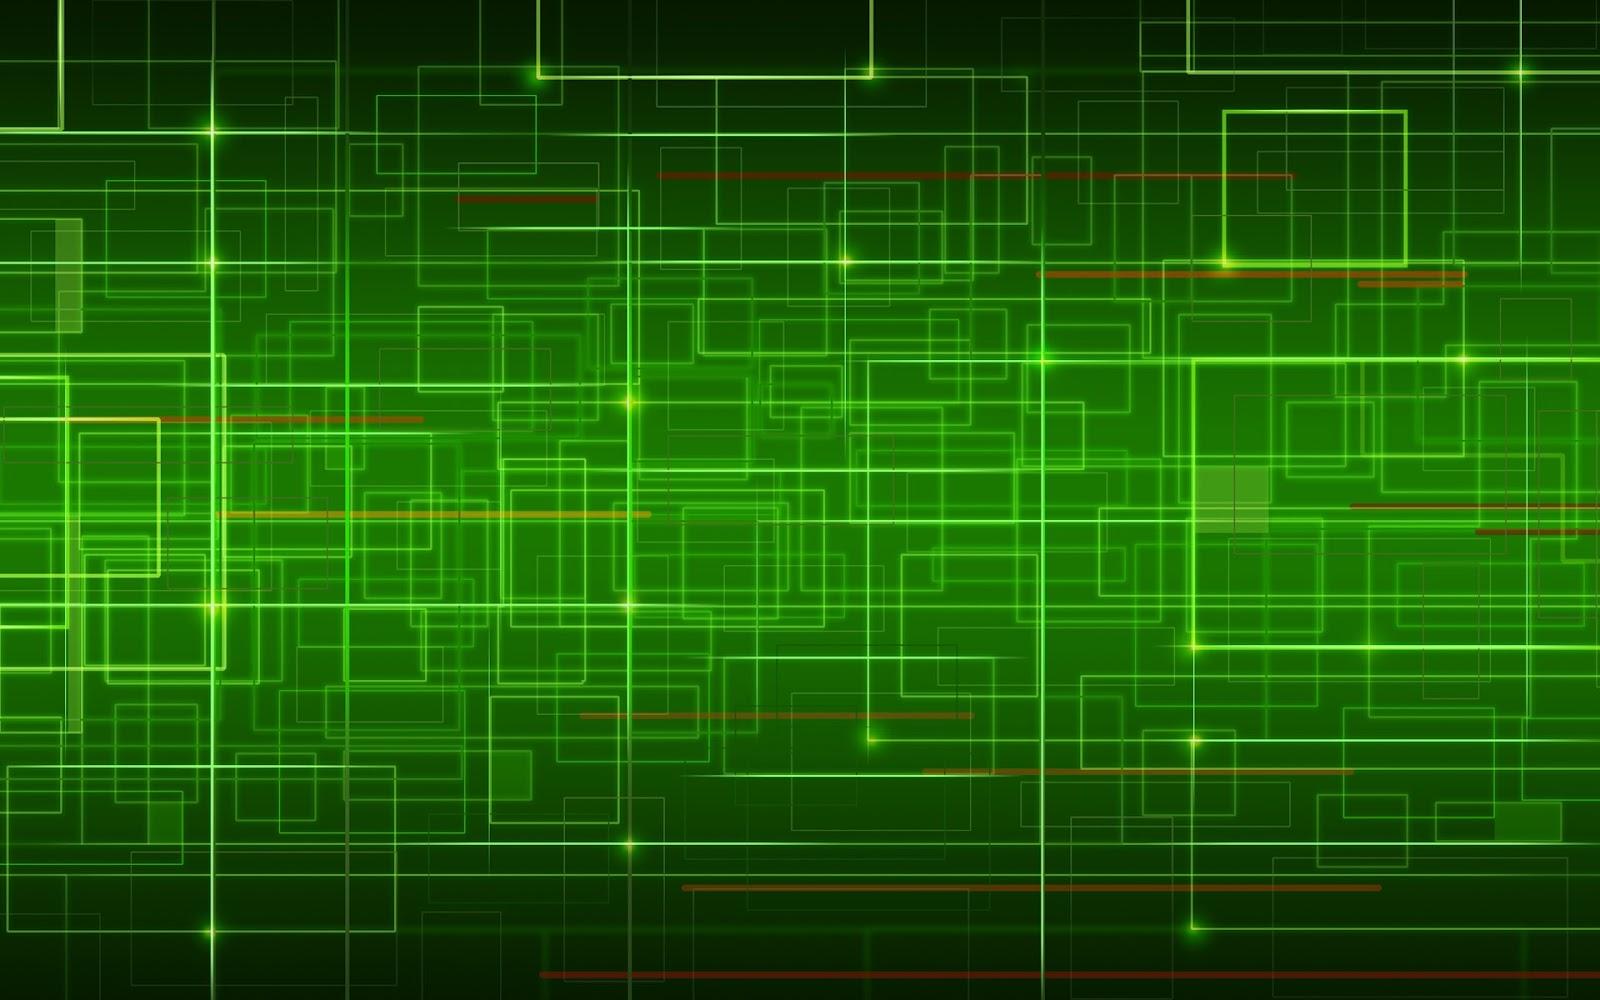 Best Green wallpaper HD Cool HD Wallpapers 1600x1000